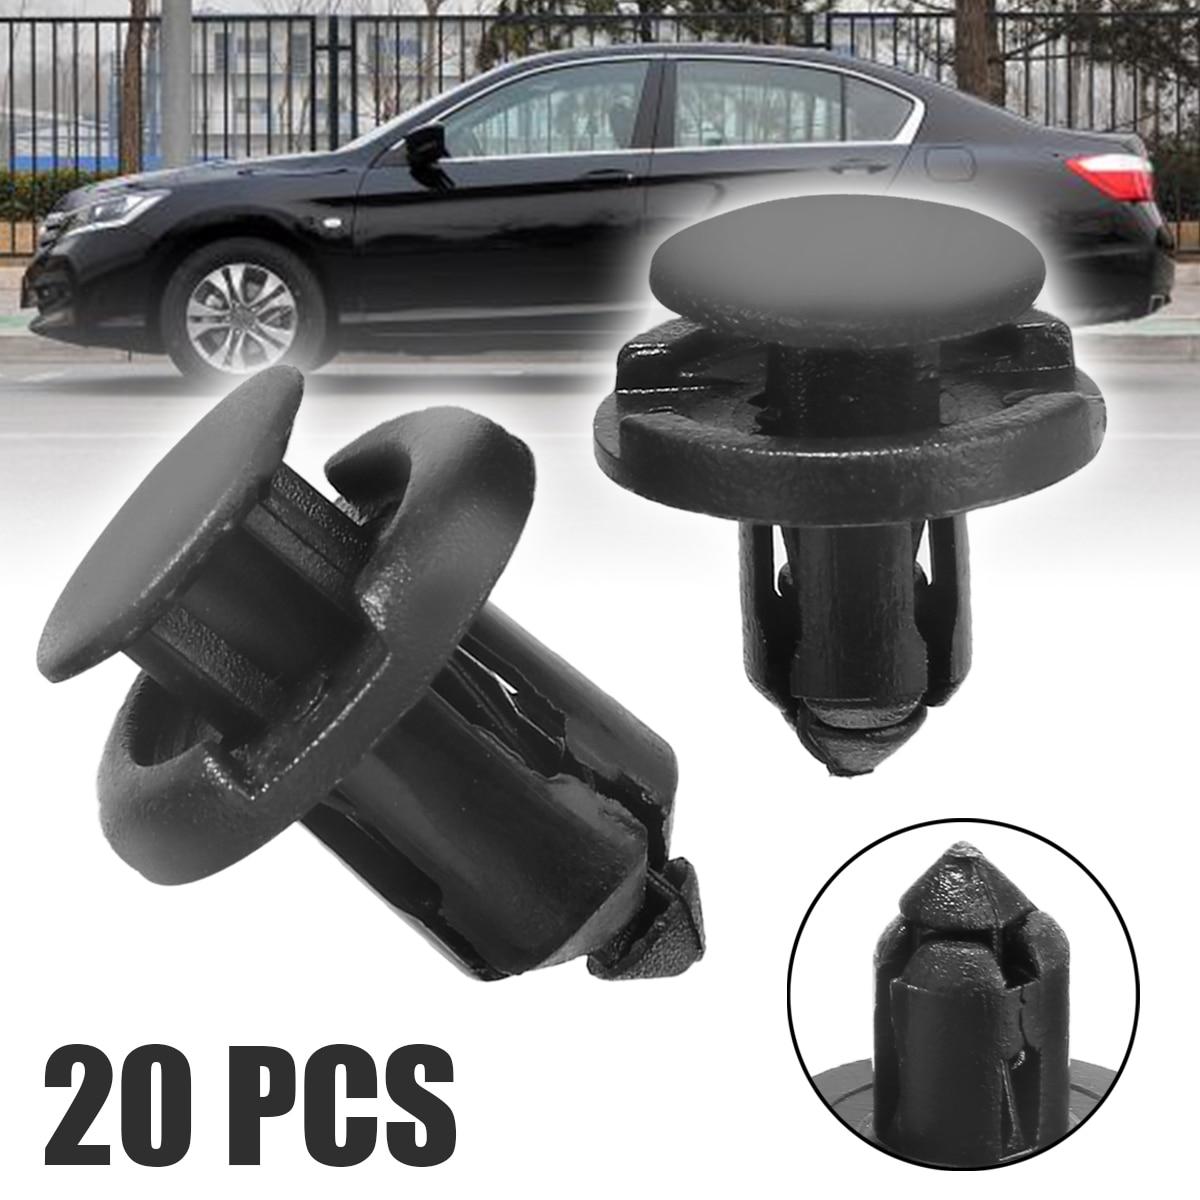 US 50Pcs Door Panel Lining Retainer Push Clips White for Honda Accord Civic CRV